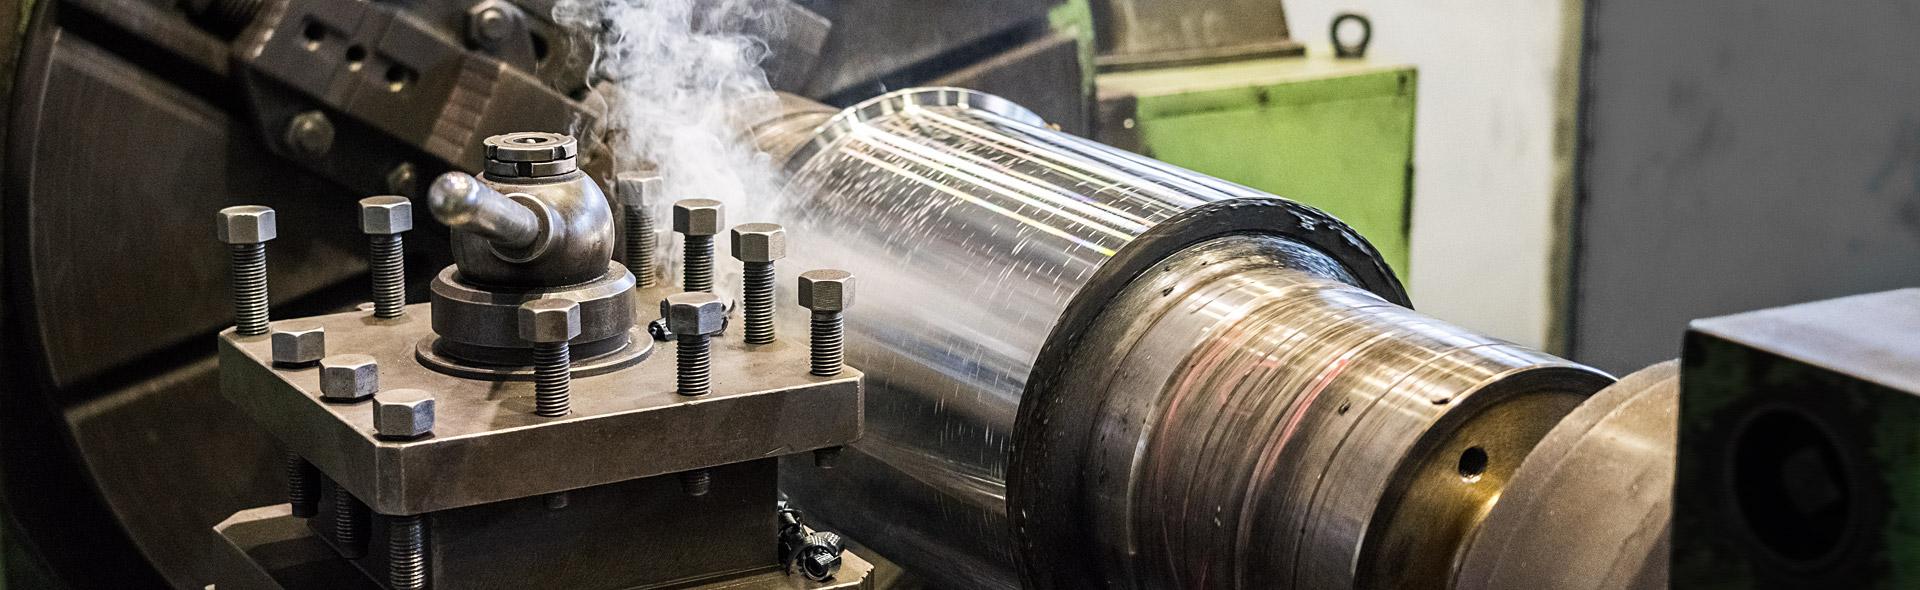 Leistung Hobeln | Maschinenbau Mundil